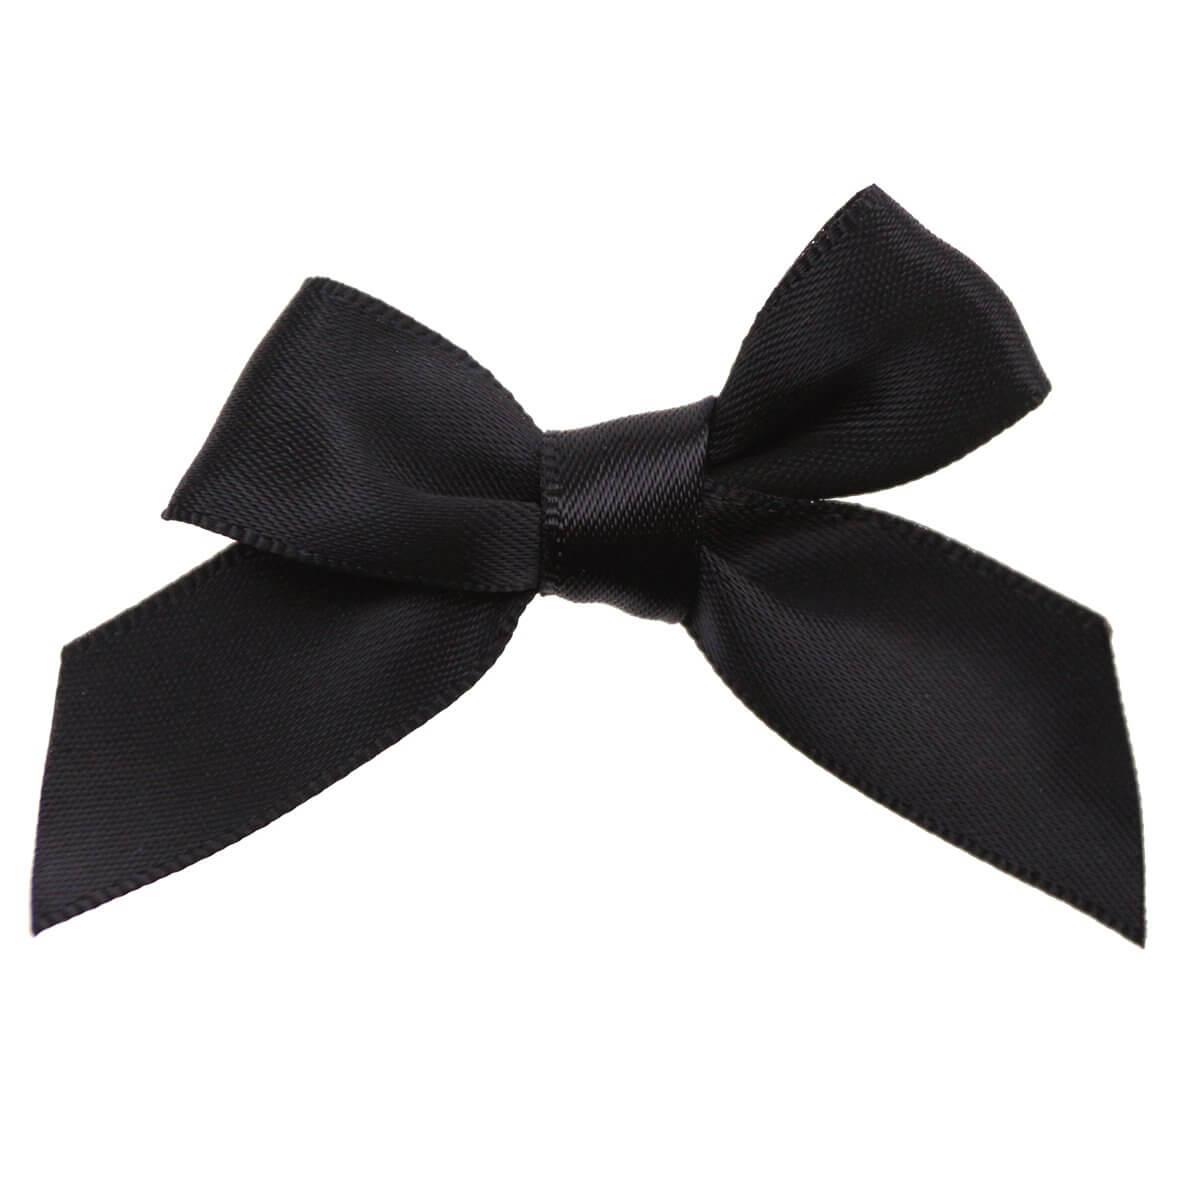 Black Ribbon Bows 15mm